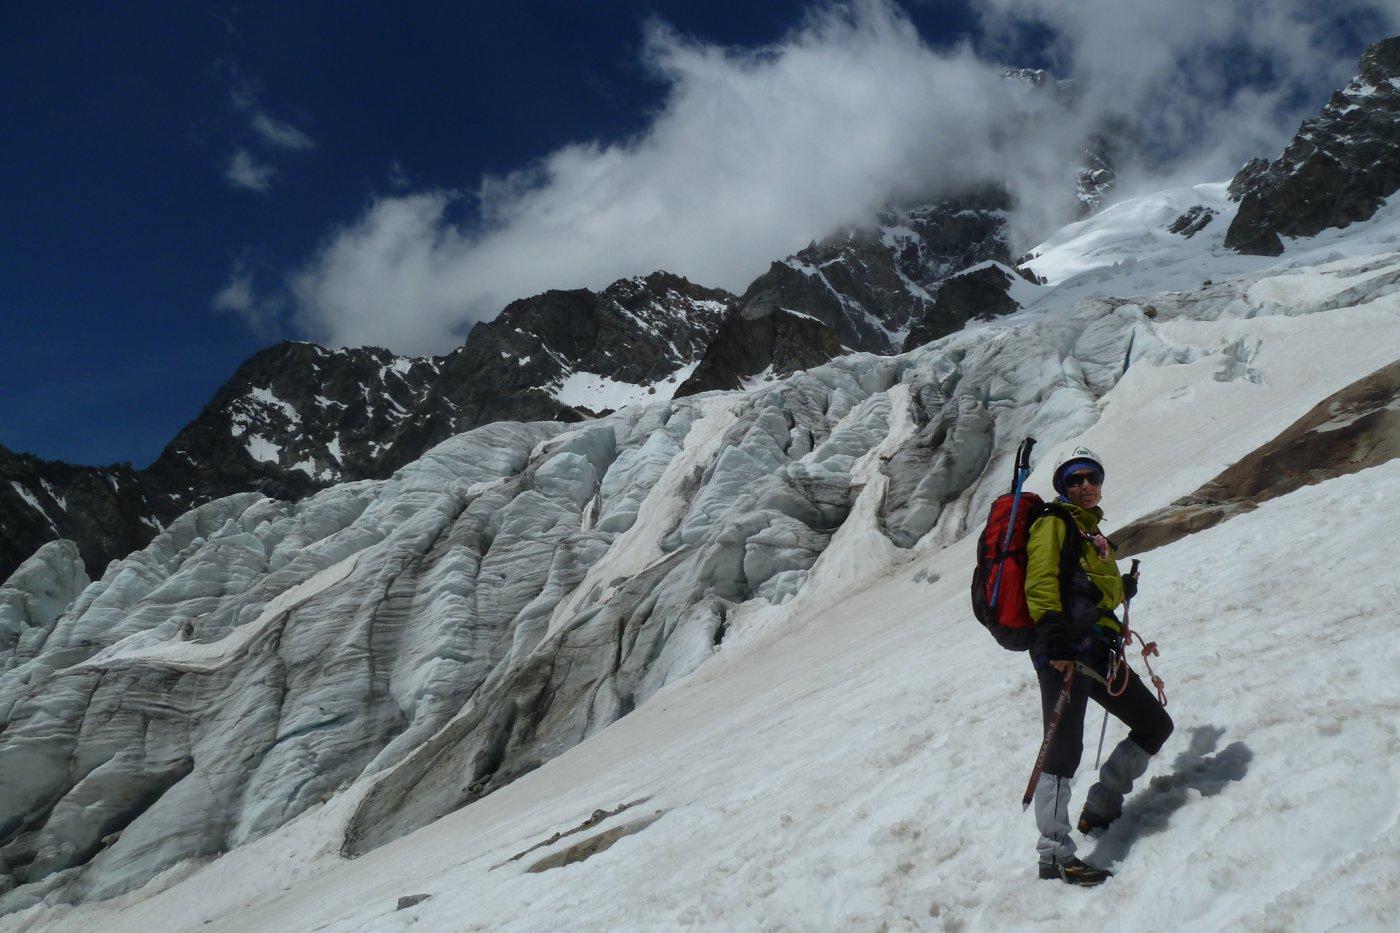 bordeggiando il ghiacciaio